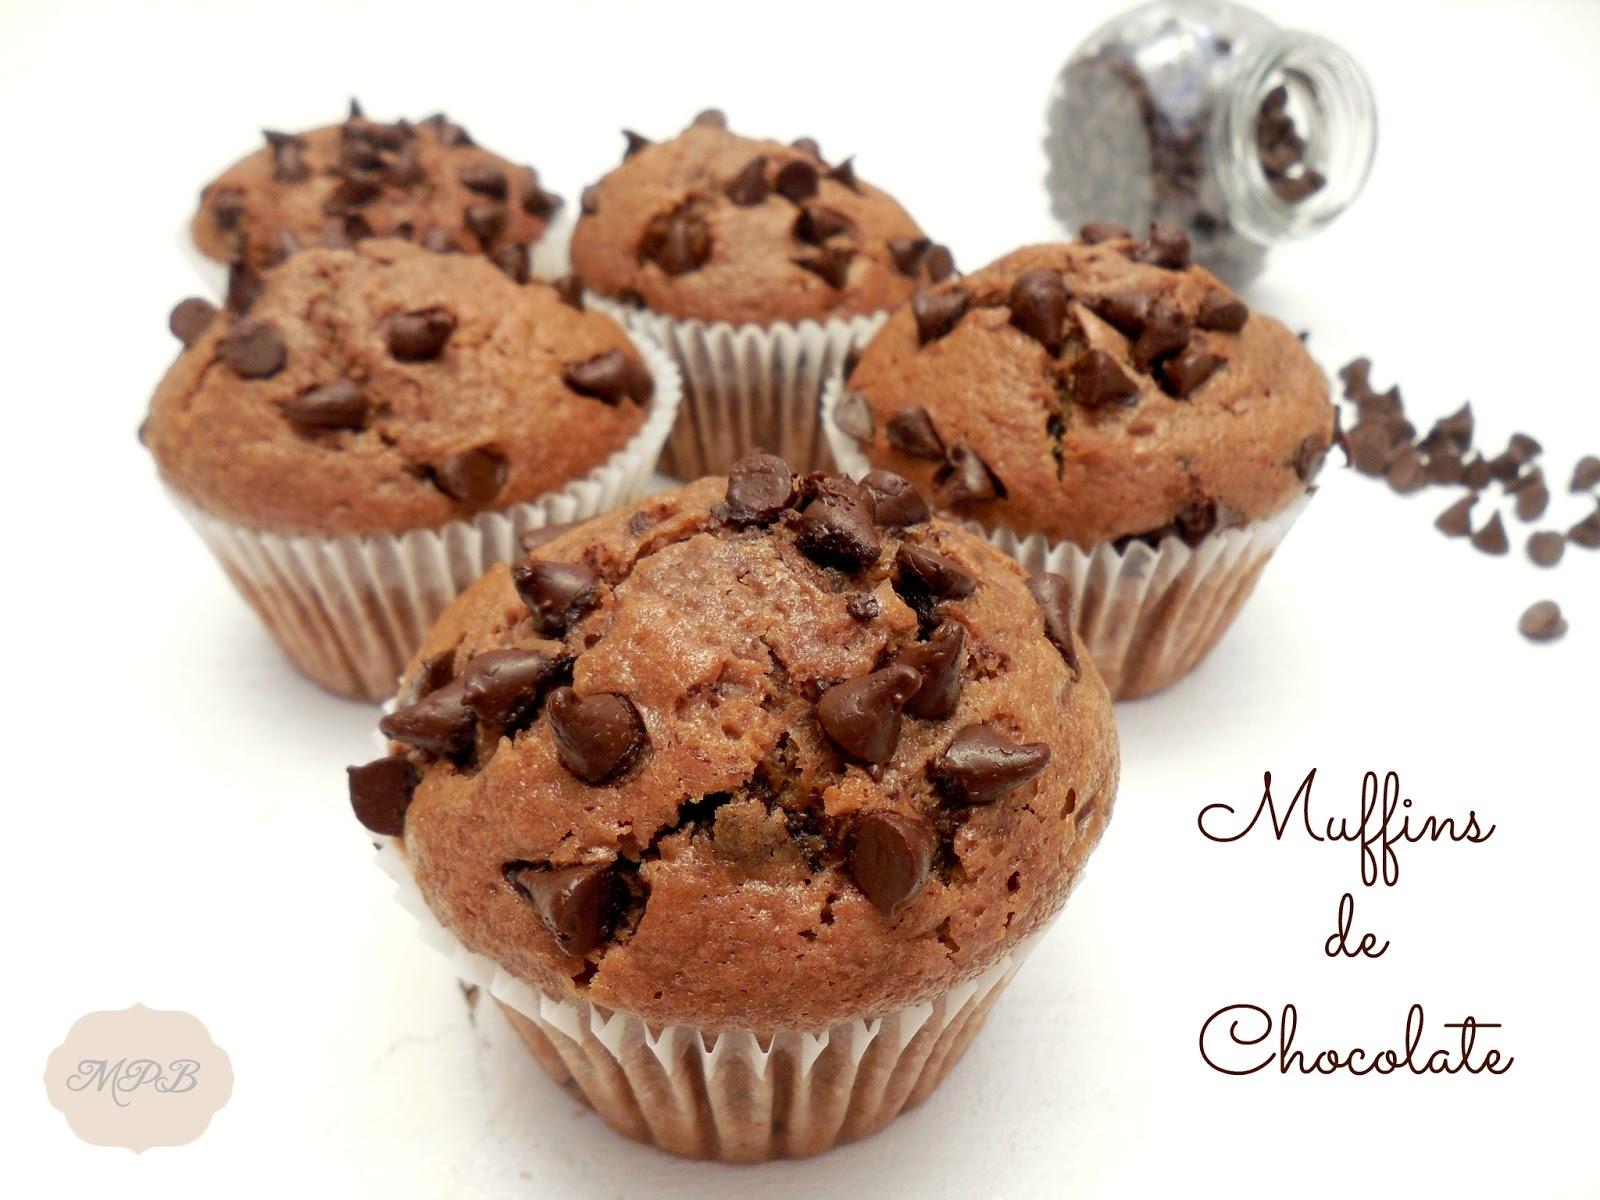 Muffins de chocolate (tipo Starbucks®)